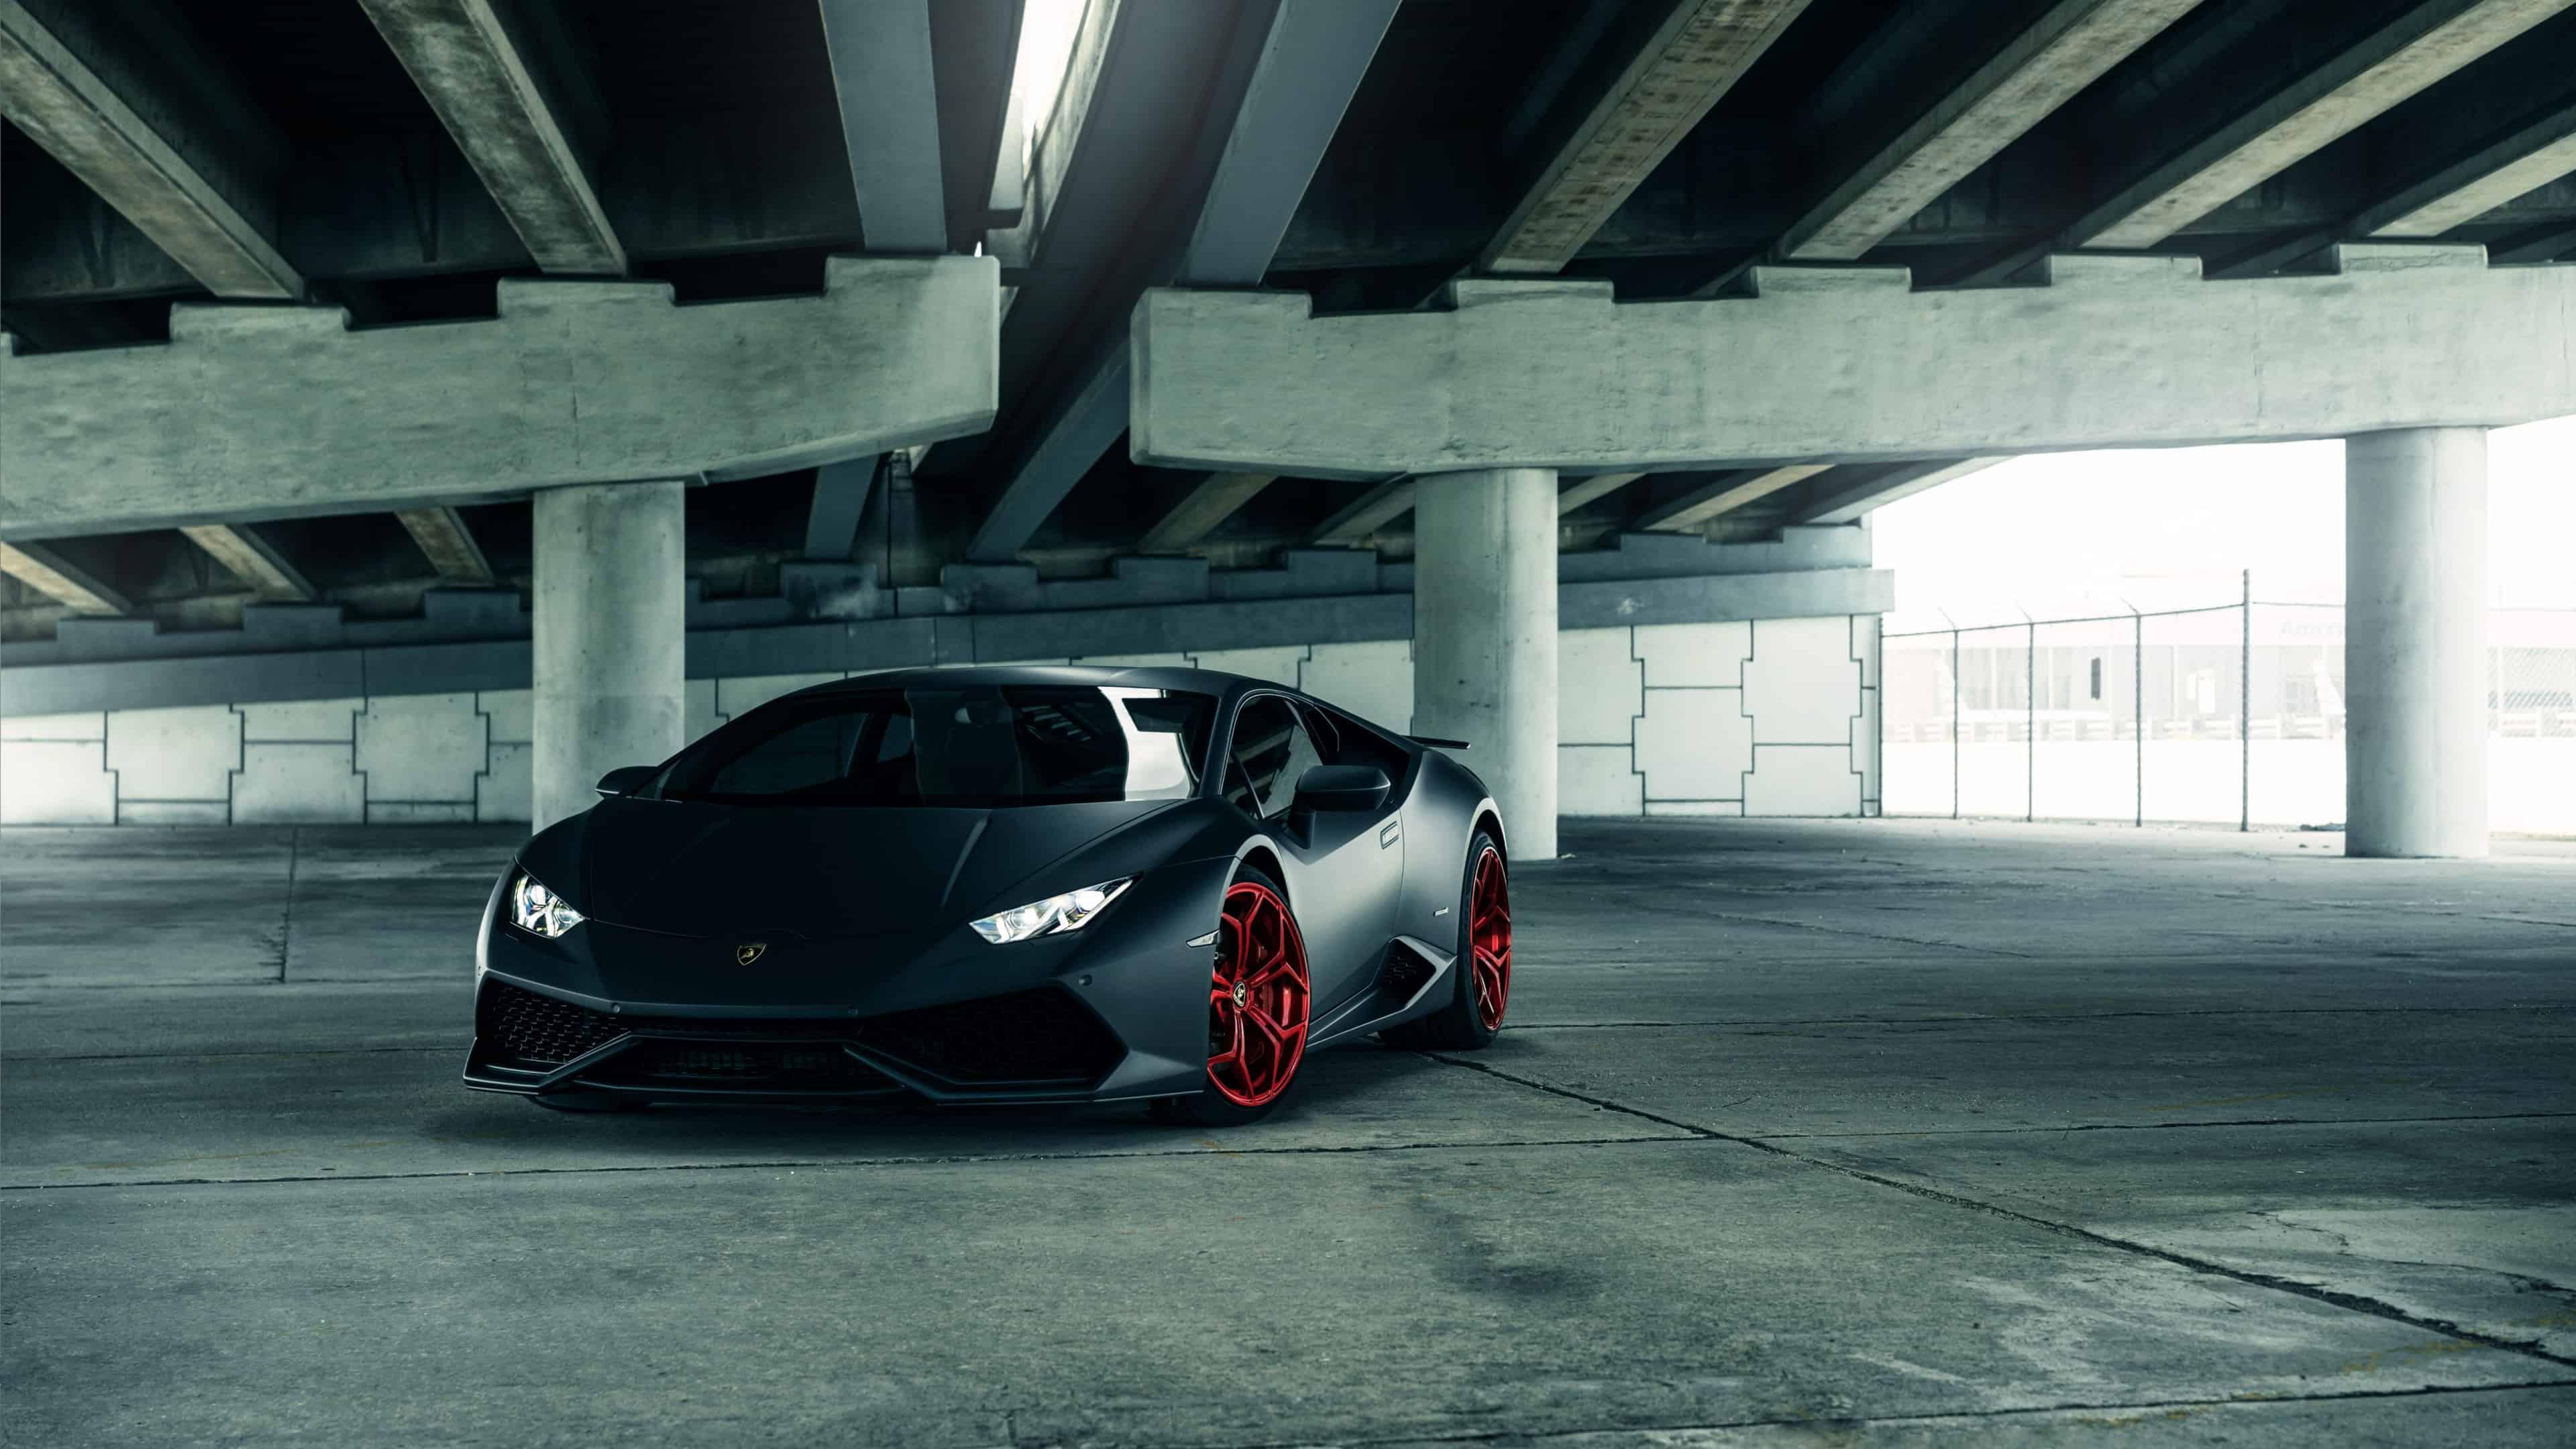 Lamborghini Huracan Black Uhd 4k Wallpaper Pixelz